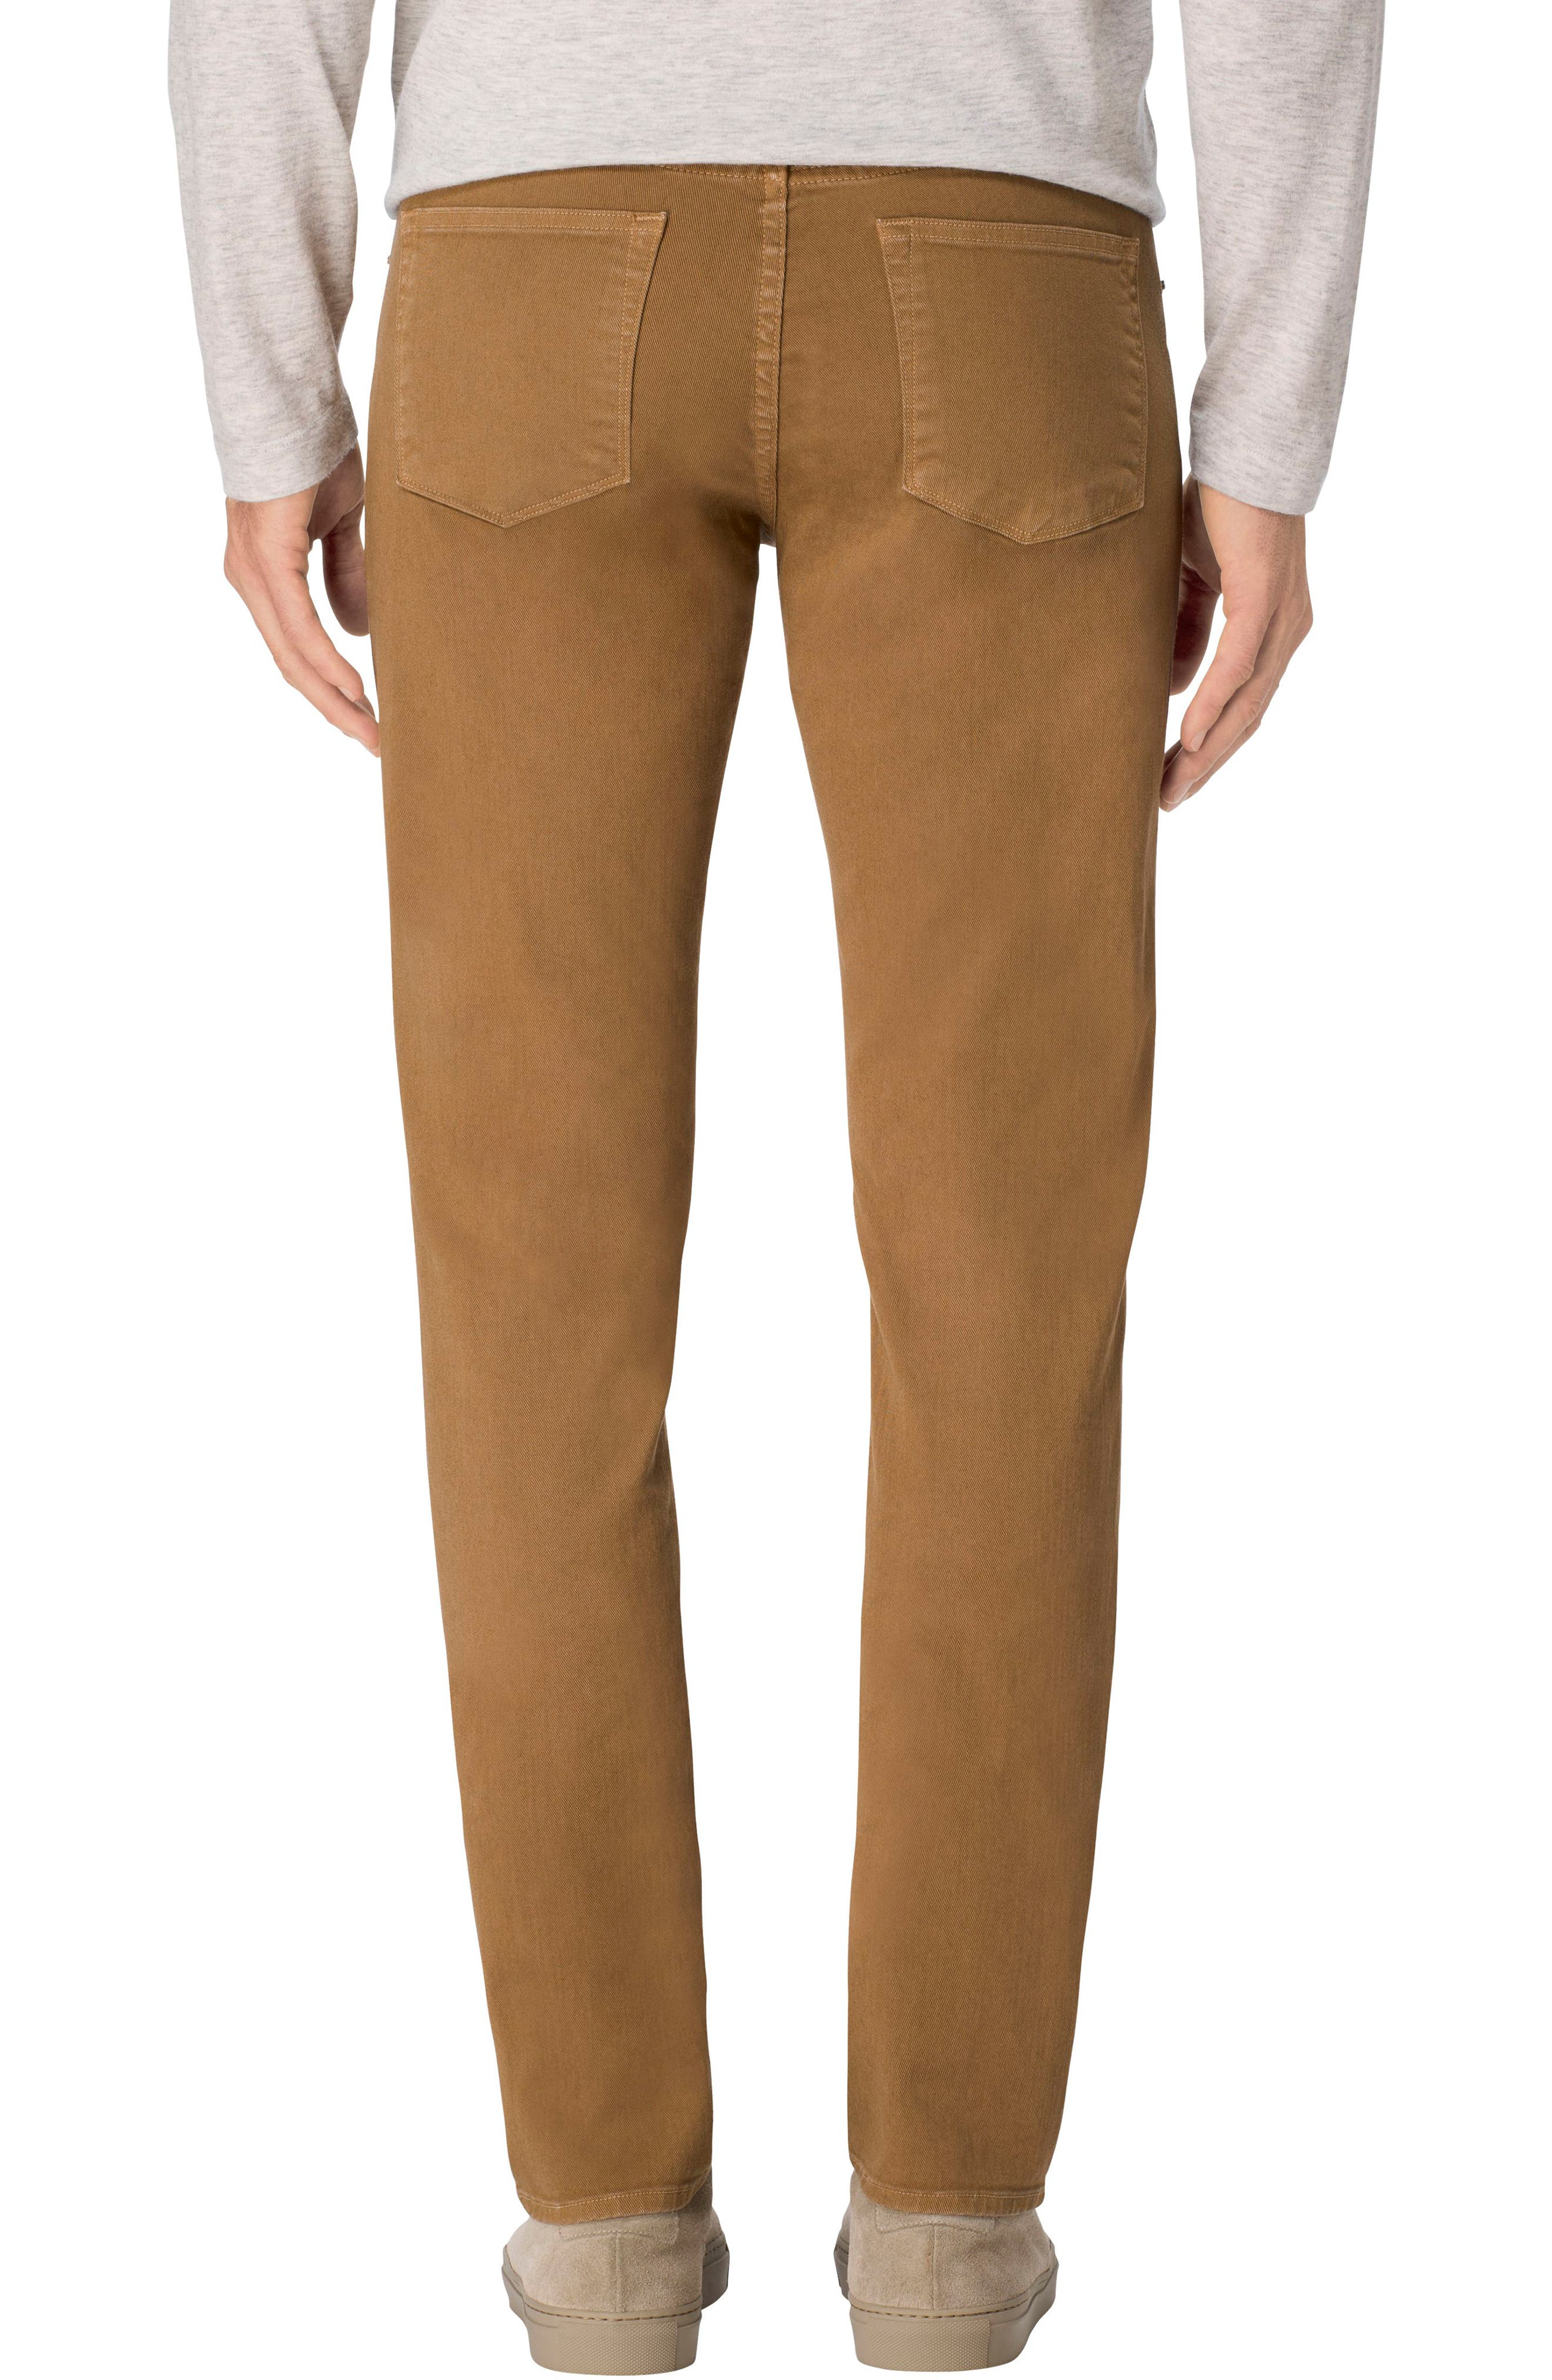 Tyler Slim Fit Jeans,                             Alternate thumbnail 2, color,                             709